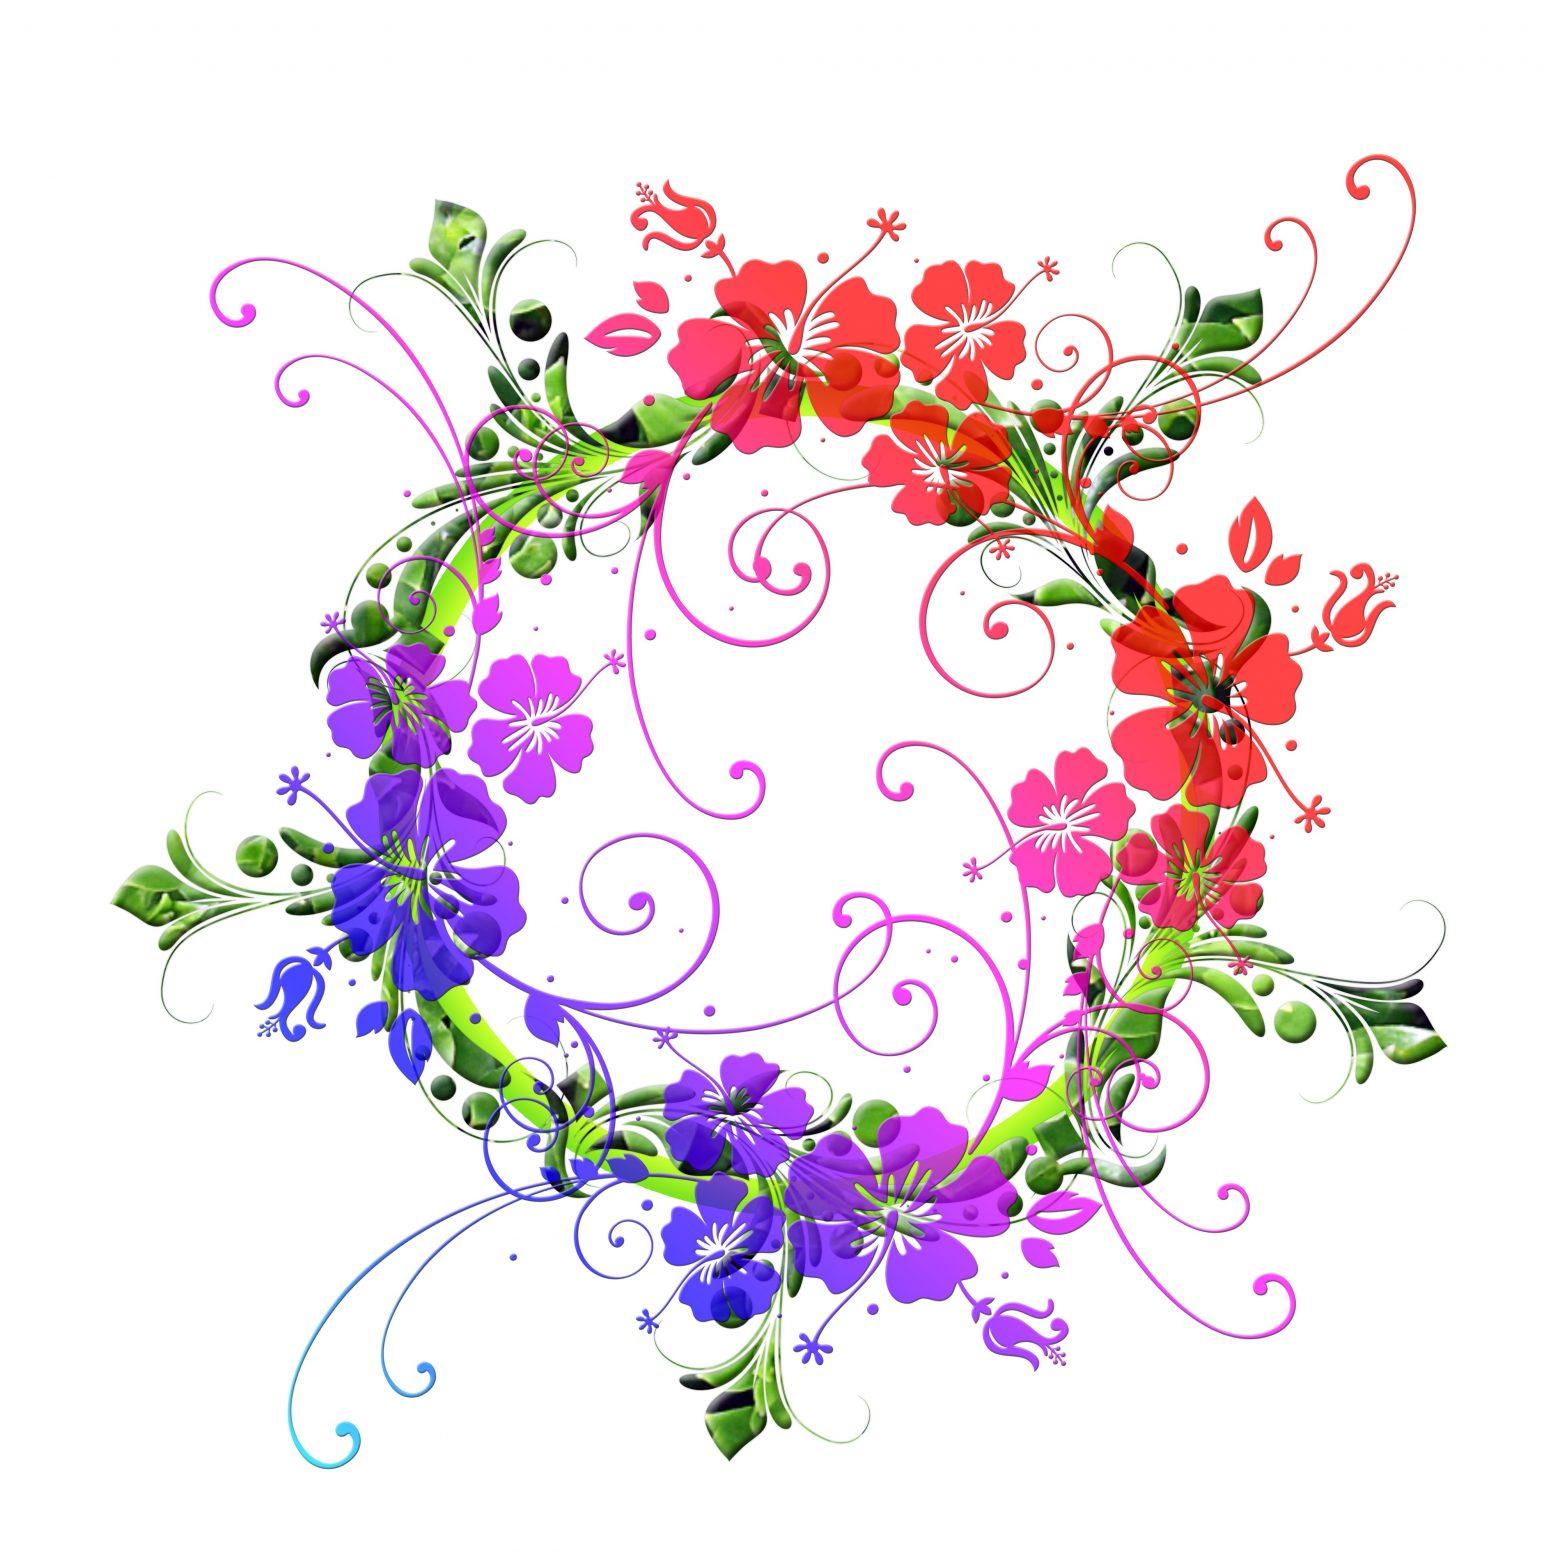 flowers-98152